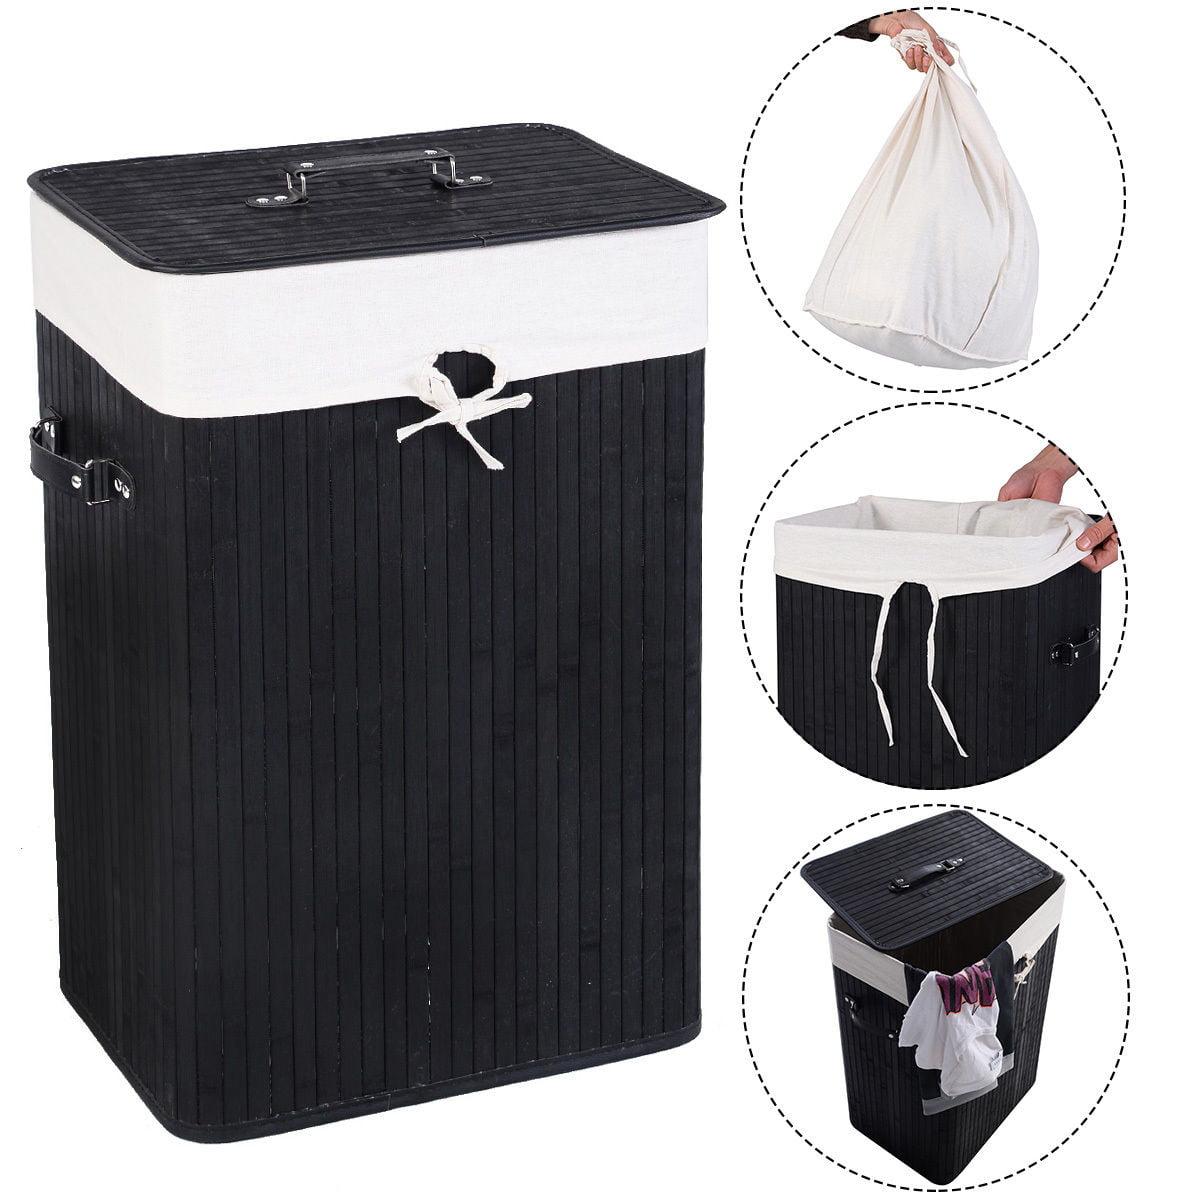 Costway Rectangle Bamboo Hamper Laundry Basket Washing Cloth Bin Rangier Lid Black